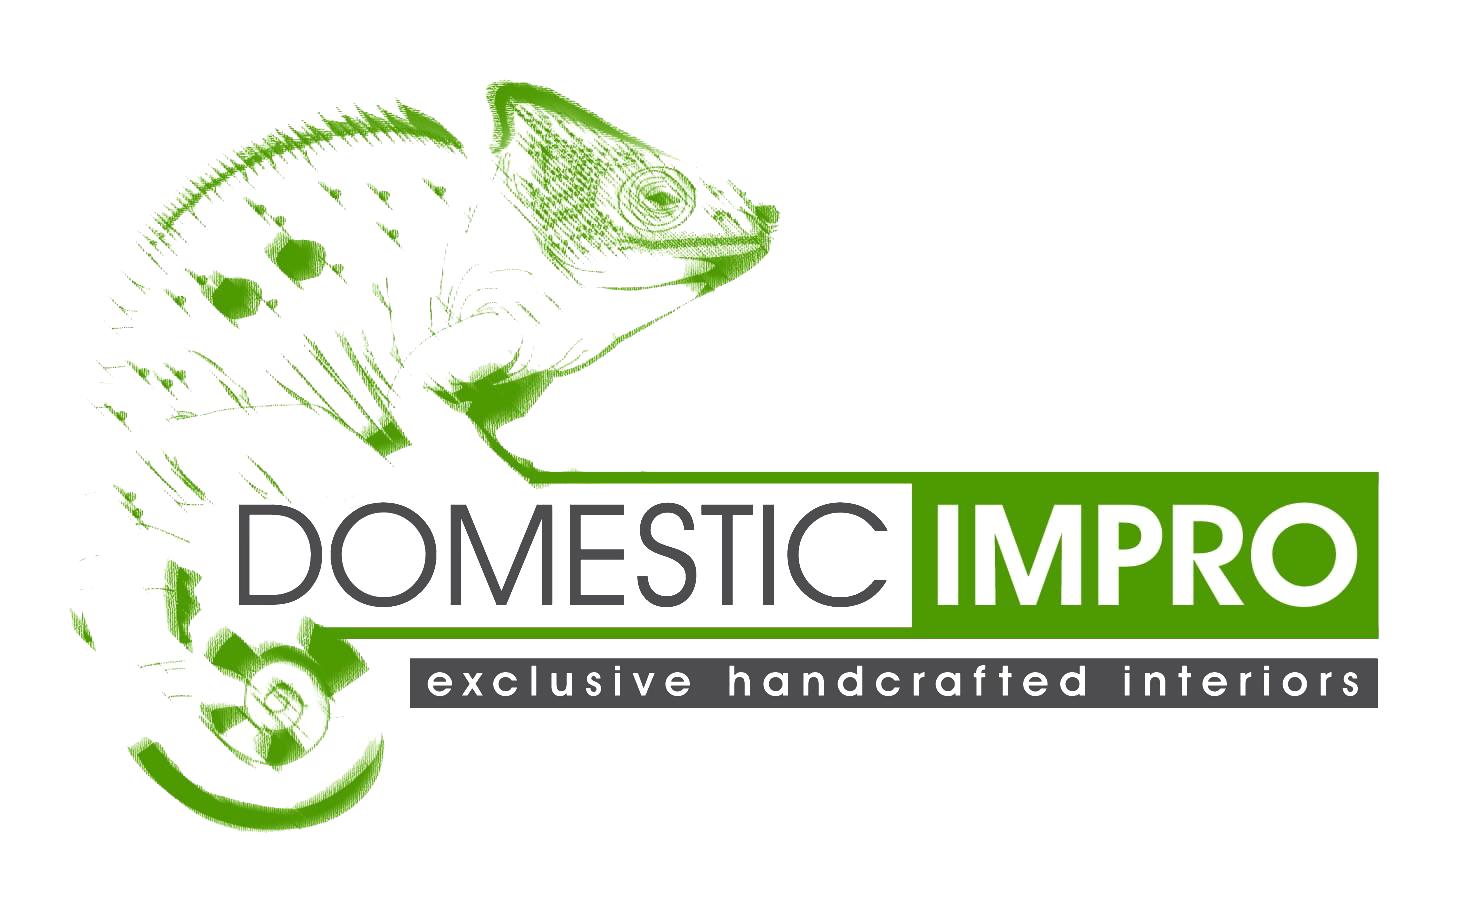 Domestic Impro